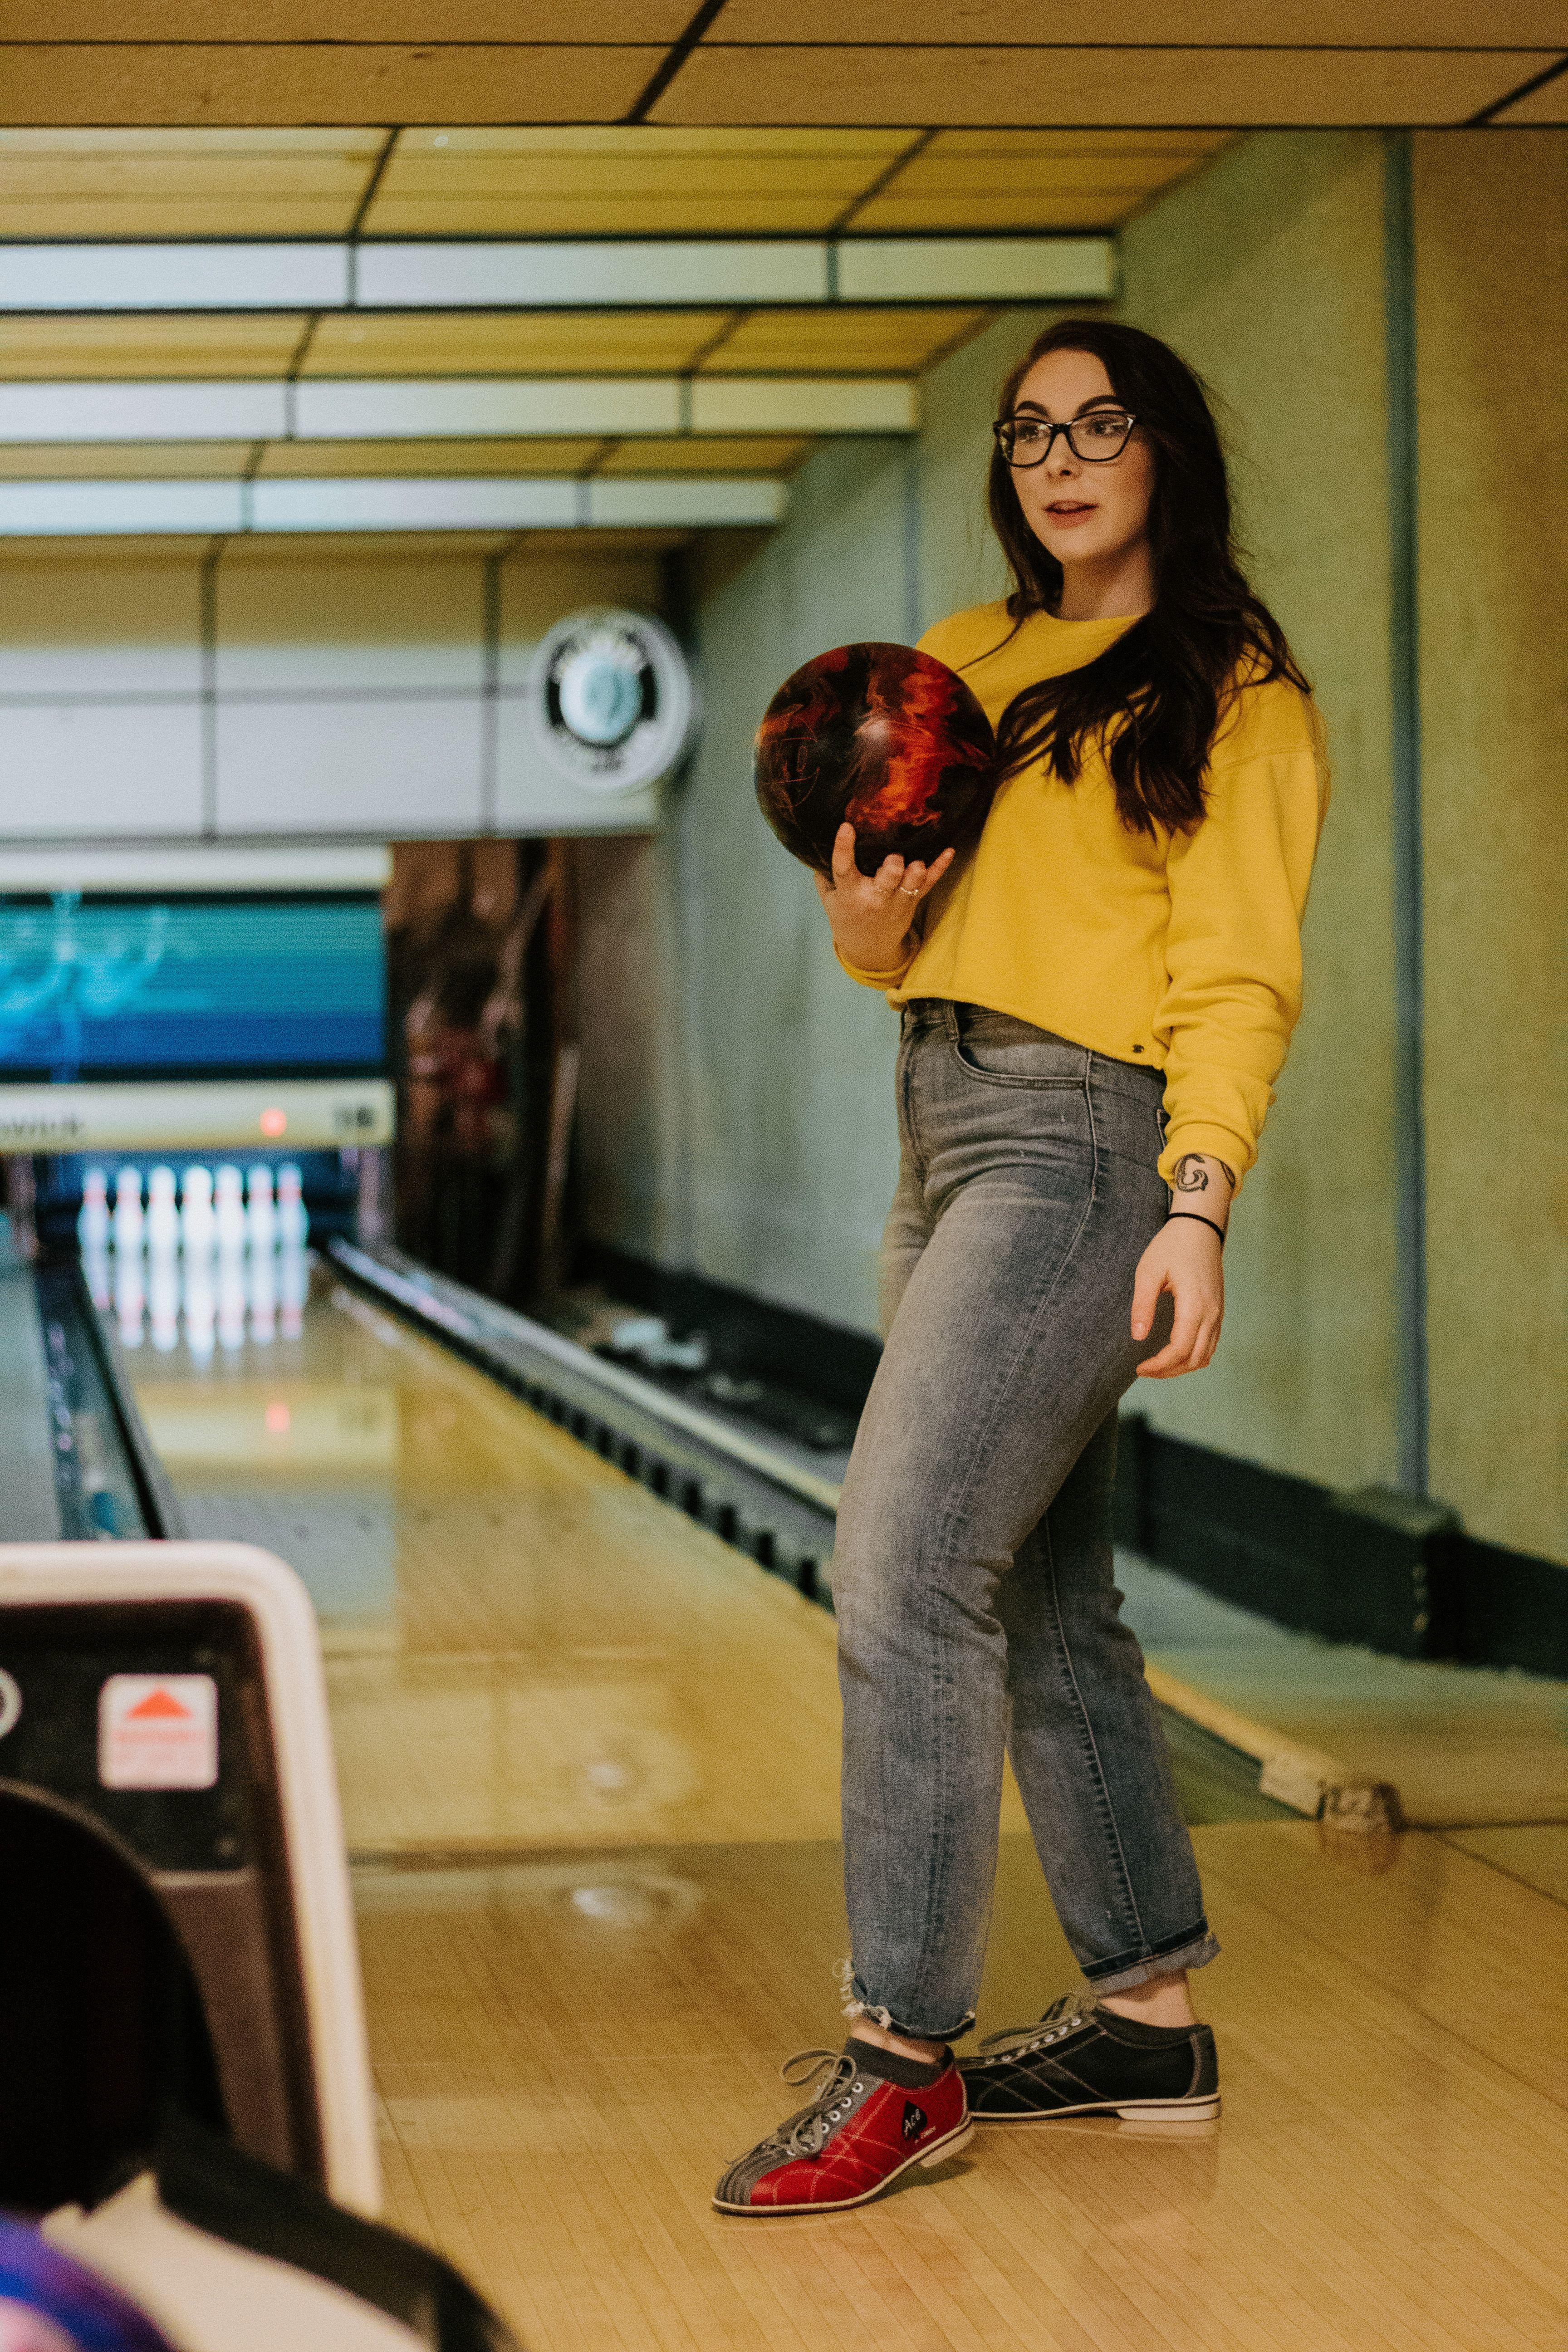 Let S Go Bowling Vintage Photoshoot Types Of Fashion Styles Photoshoot